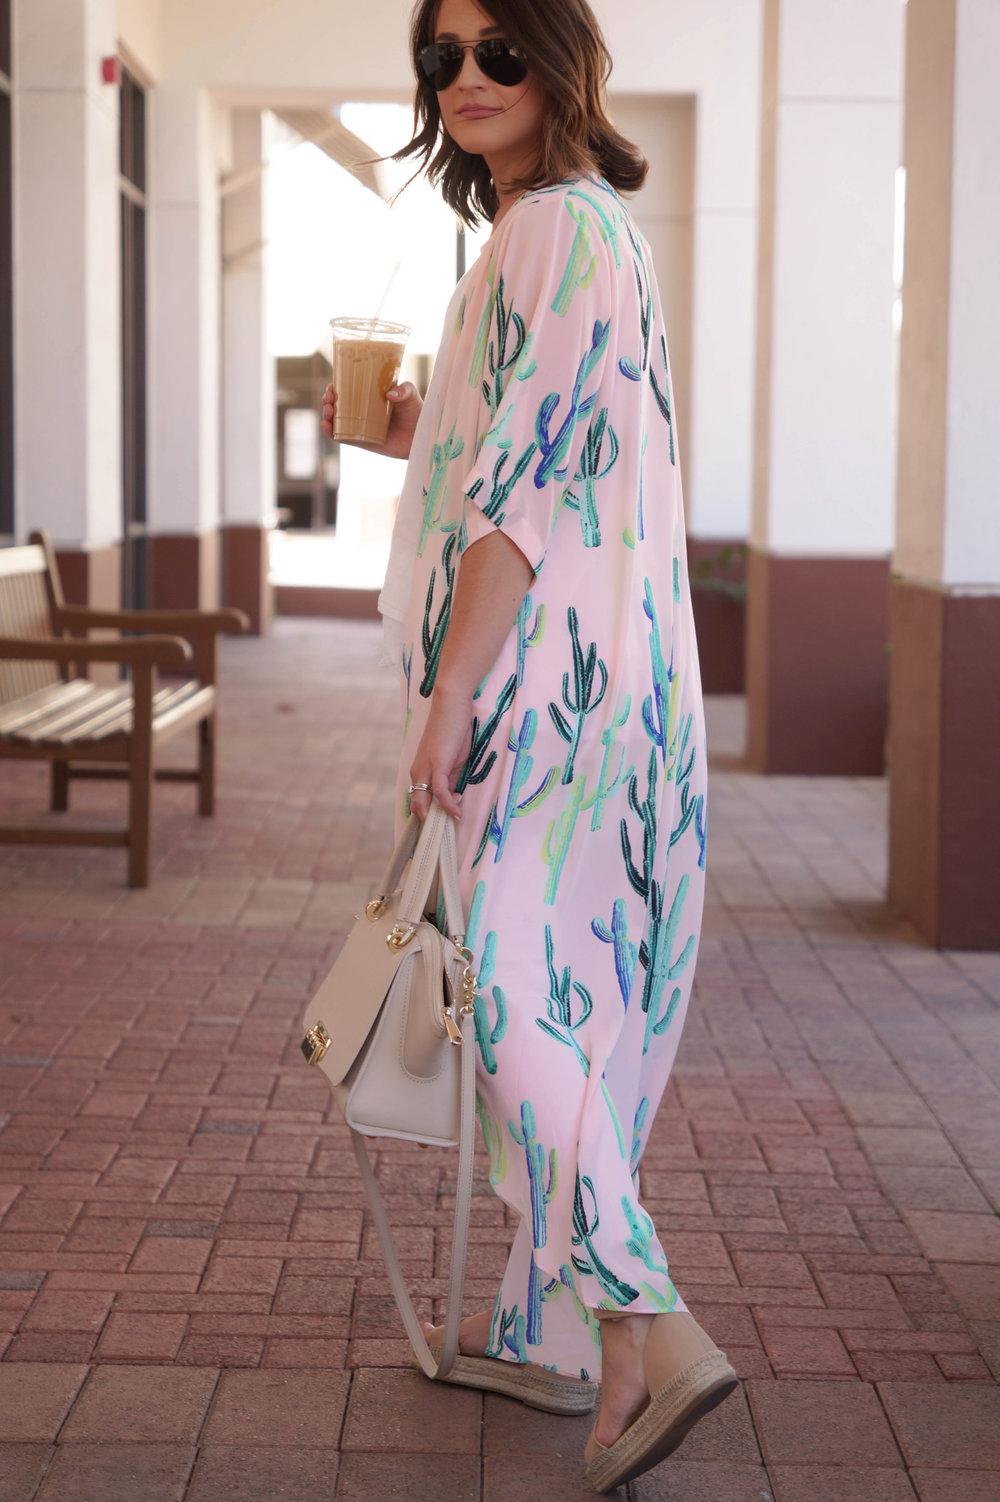 c8716f3d0 Cactus Kimono — The Golden Girl Diary